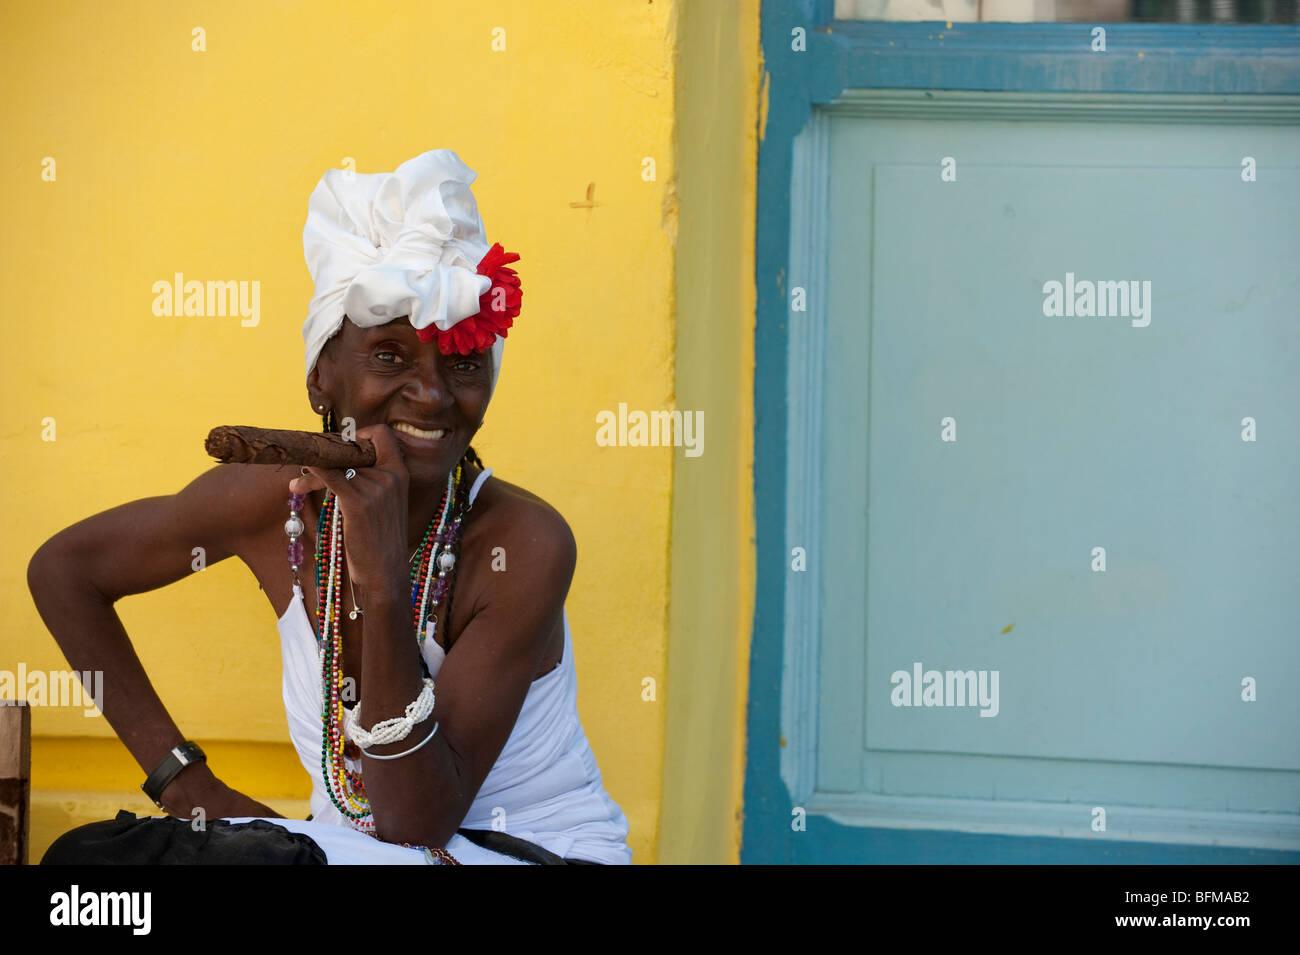 Cigar In Havana Stock Photos & Cigar In Havana Stock Images - Alamy